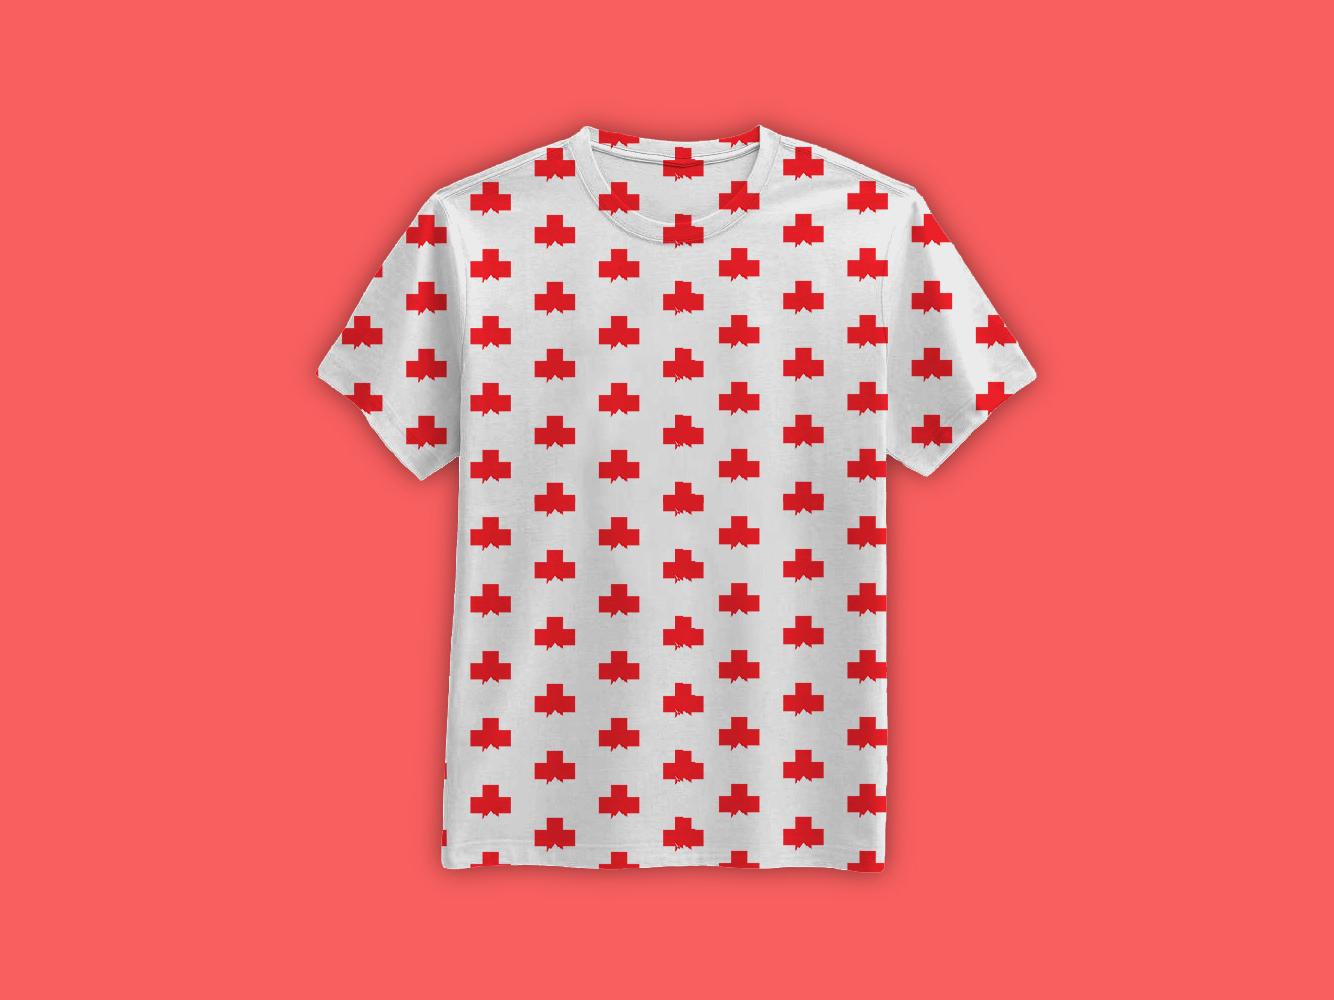 T-shirt Design fashion clothing pattern t-shirt apparel typography illustration logomark brand identity mark brand symbol icon logo